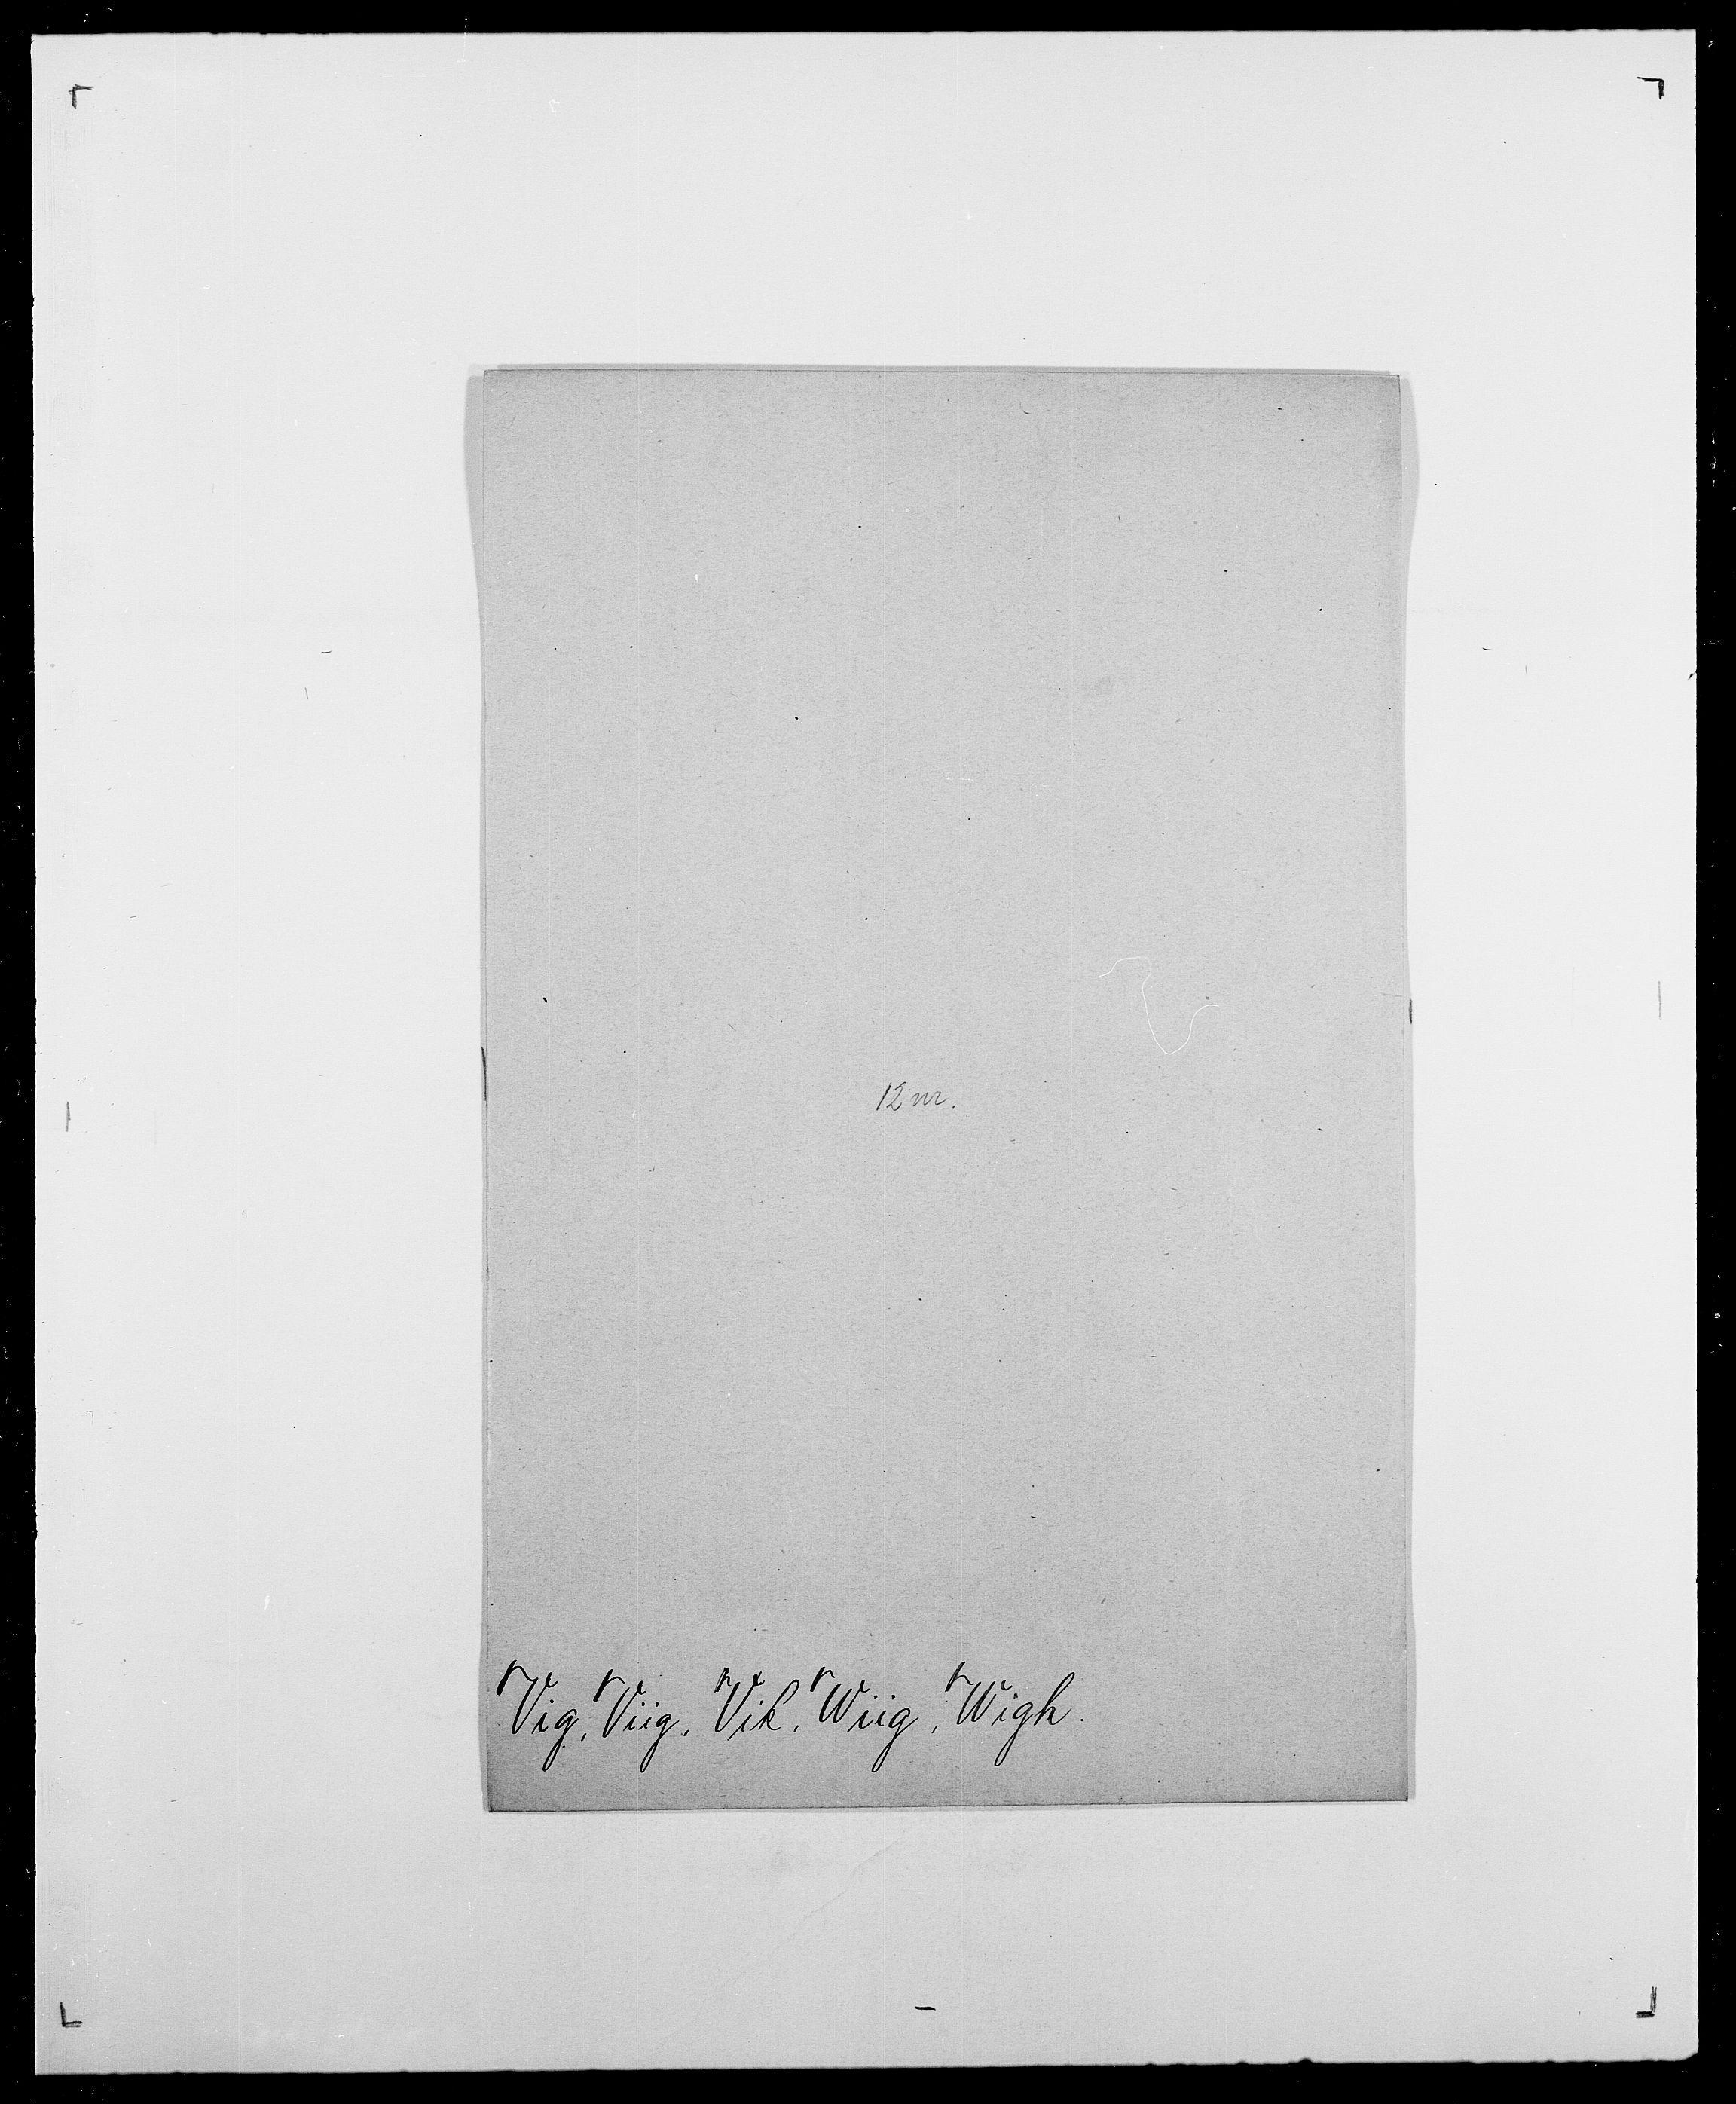 SAO, Delgobe, Charles Antoine - samling, D/Da/L0041: Vemmestad - Viker, s. 666